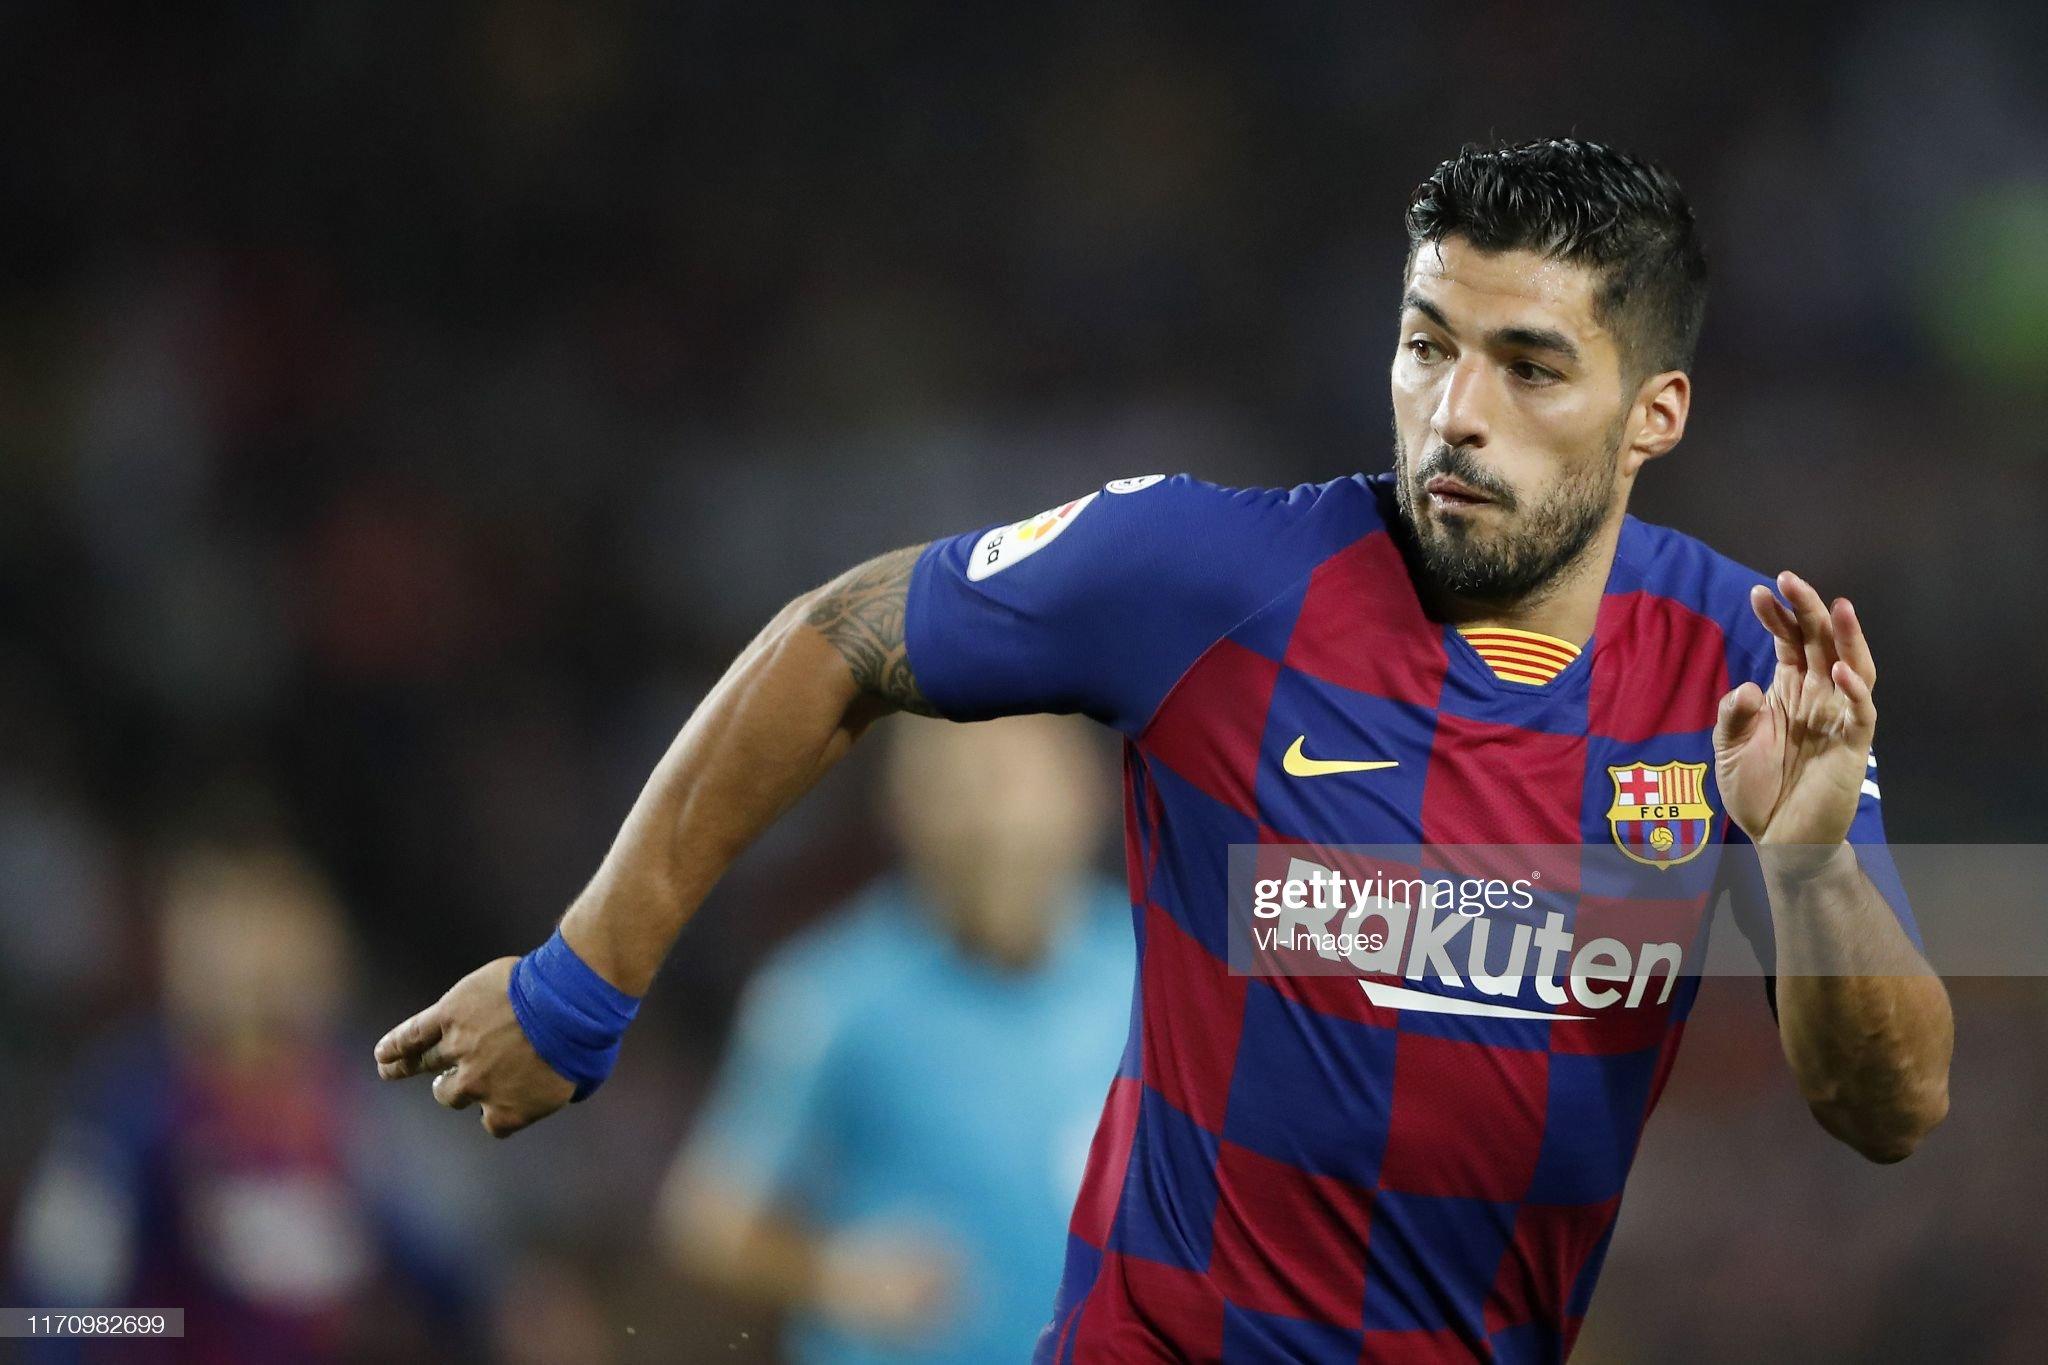 صور مباراة : برشلونة - فياريال 2-1 ( 24-09-2019 )  Luis-suarez-of-fc-barcelona-during-the-laliga-santander-match-between-picture-id1170982699?s=2048x2048